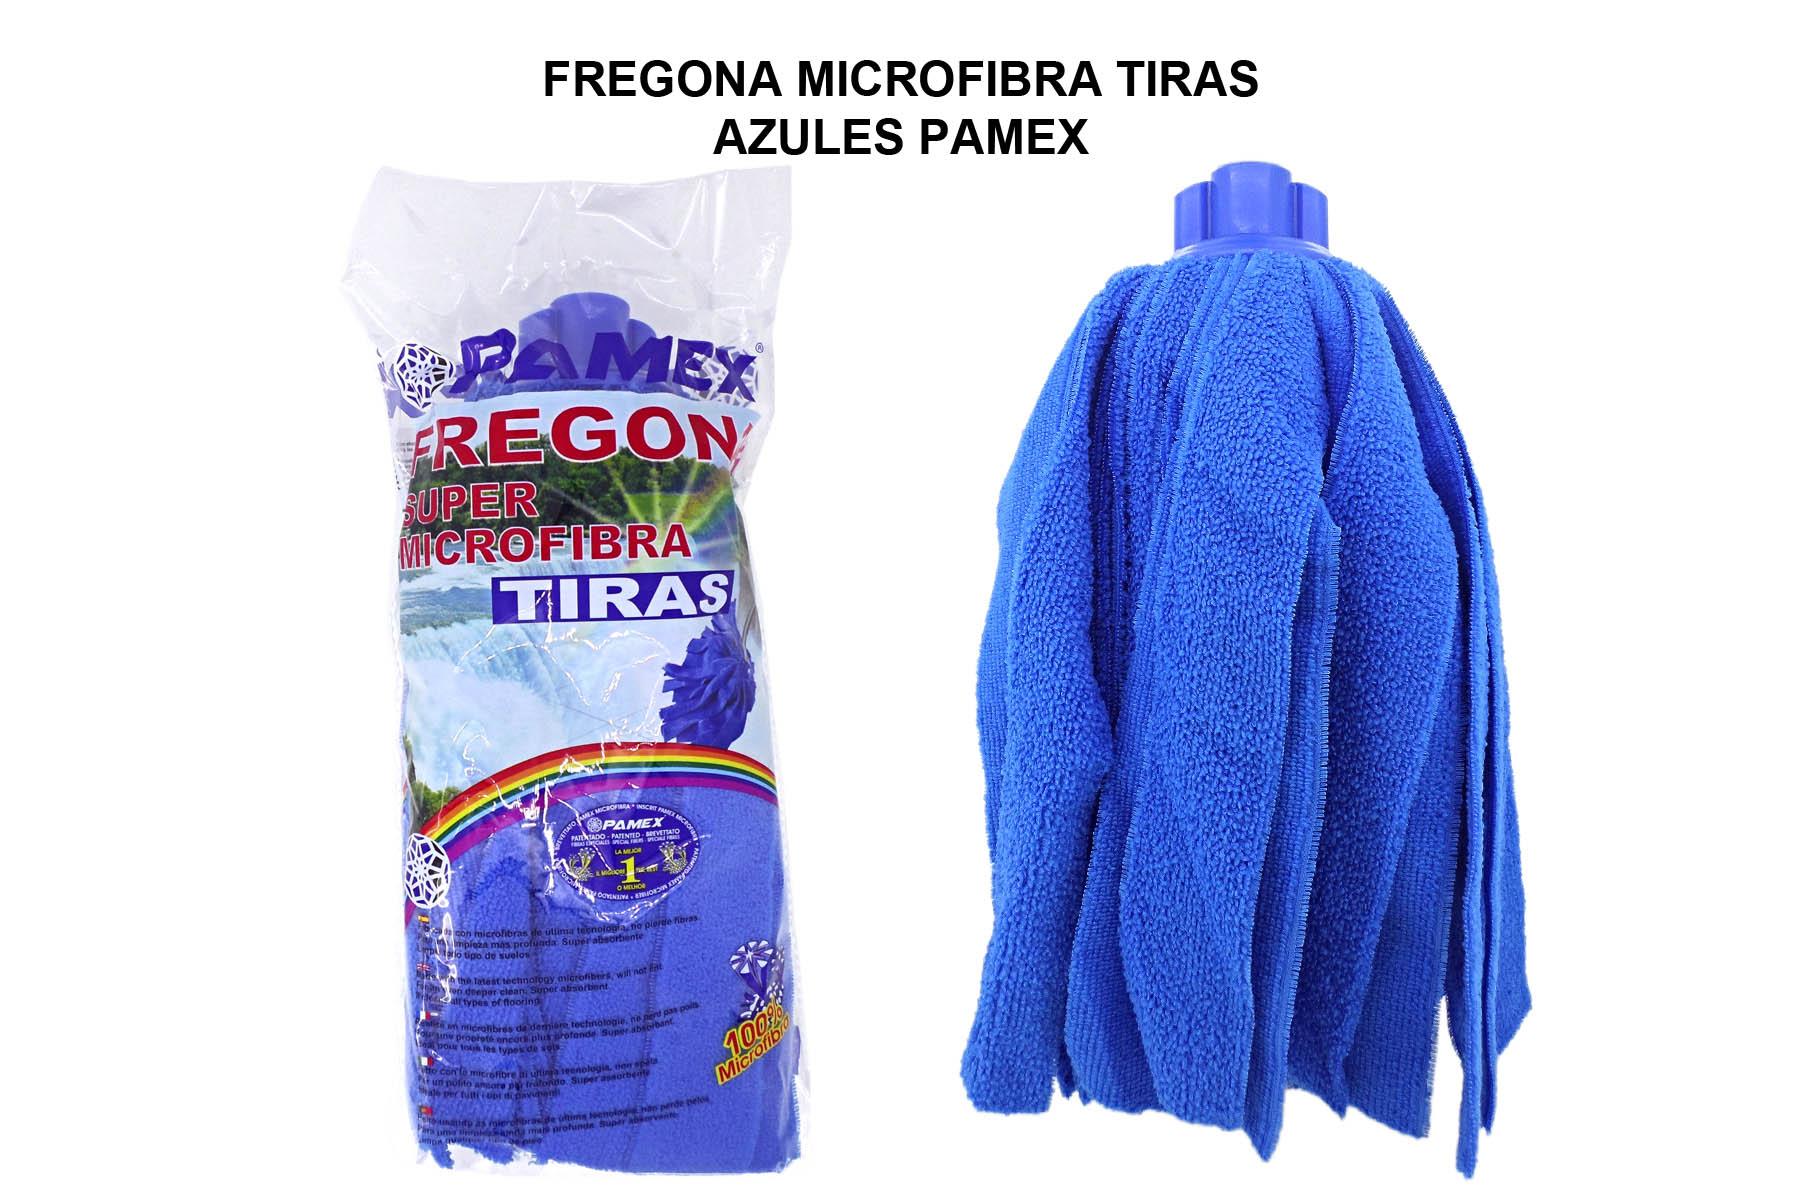 FREGONA MICROFIBRA TIRAS AZULES PAMEX